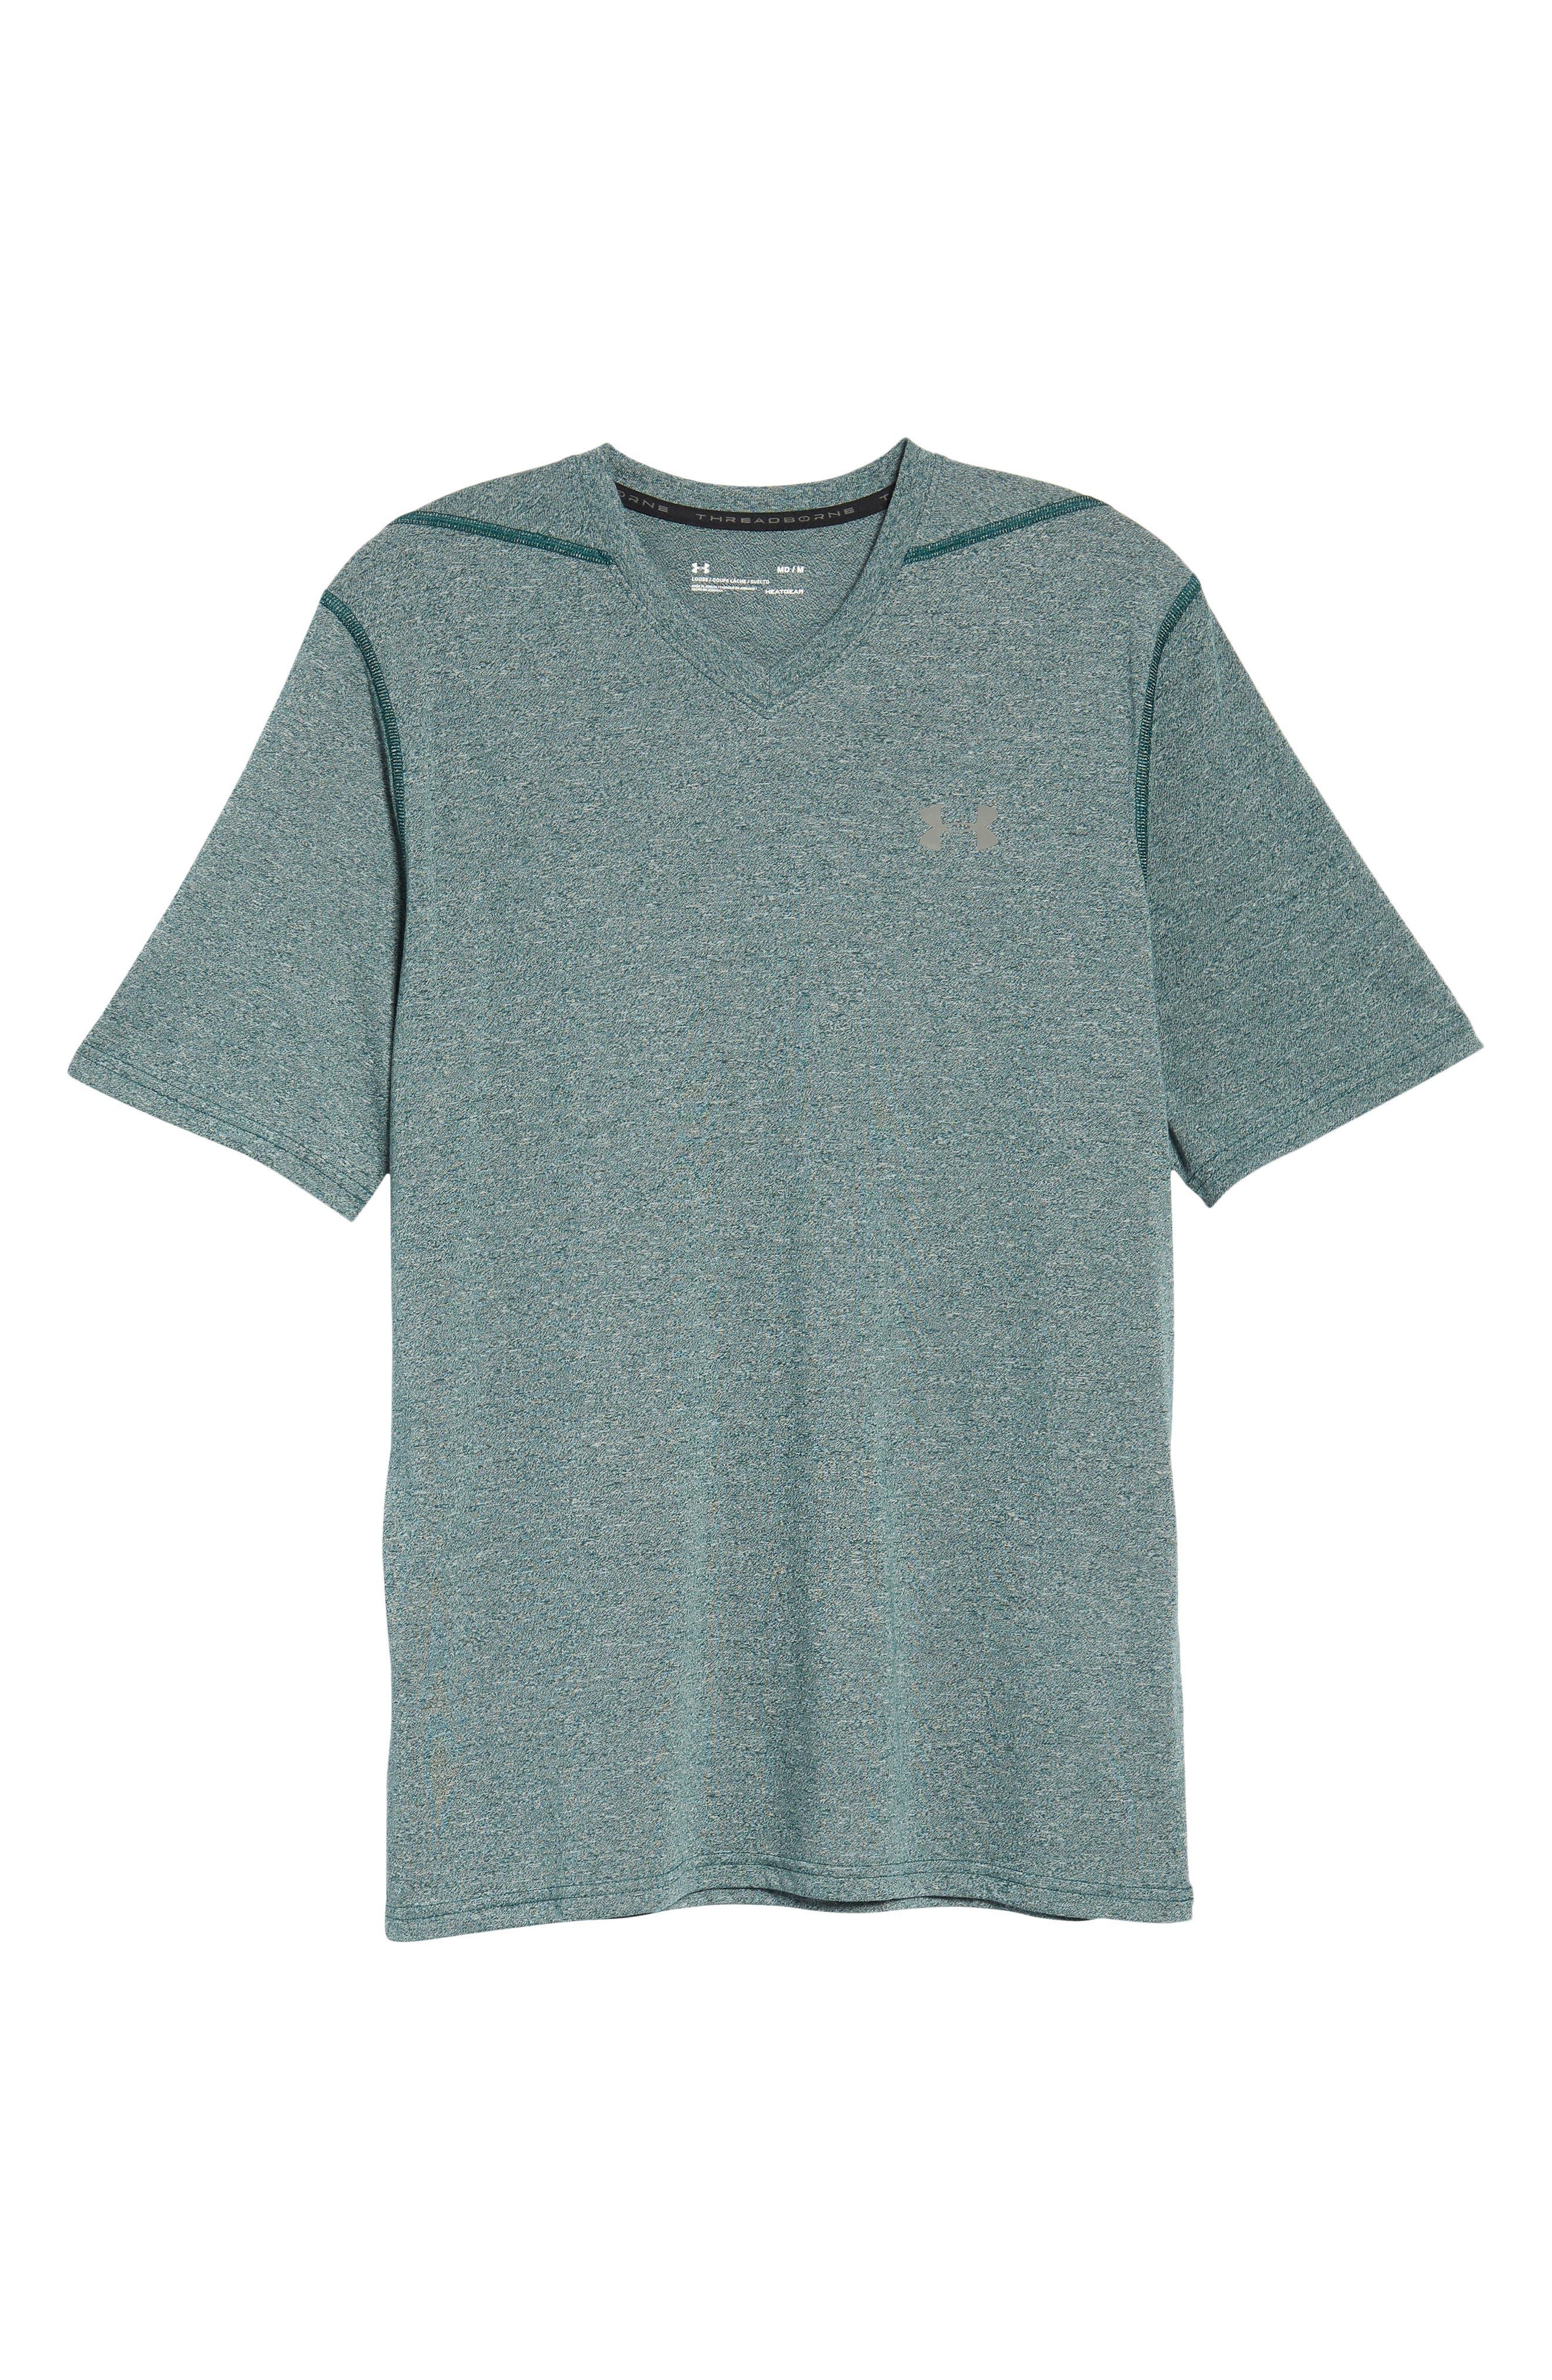 Regular Fit Threadborne T-Shirt,                             Alternate thumbnail 6, color,                             300